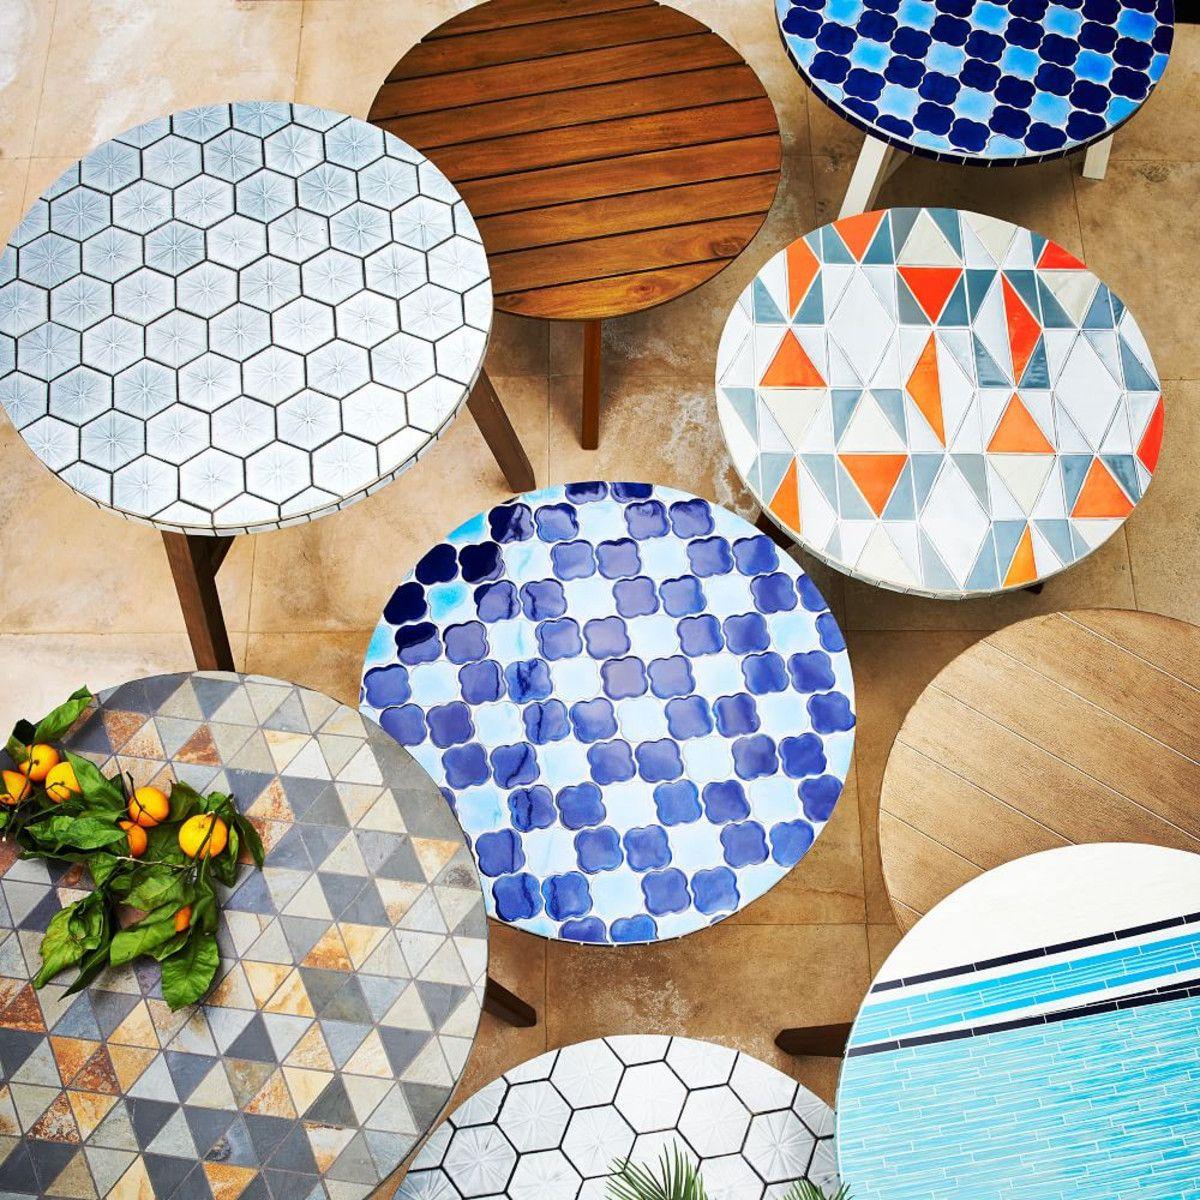 Loving these Mosaic tables  http://www.westelm.com.au/mosaic-tiled-bistro-table-orange-h1306